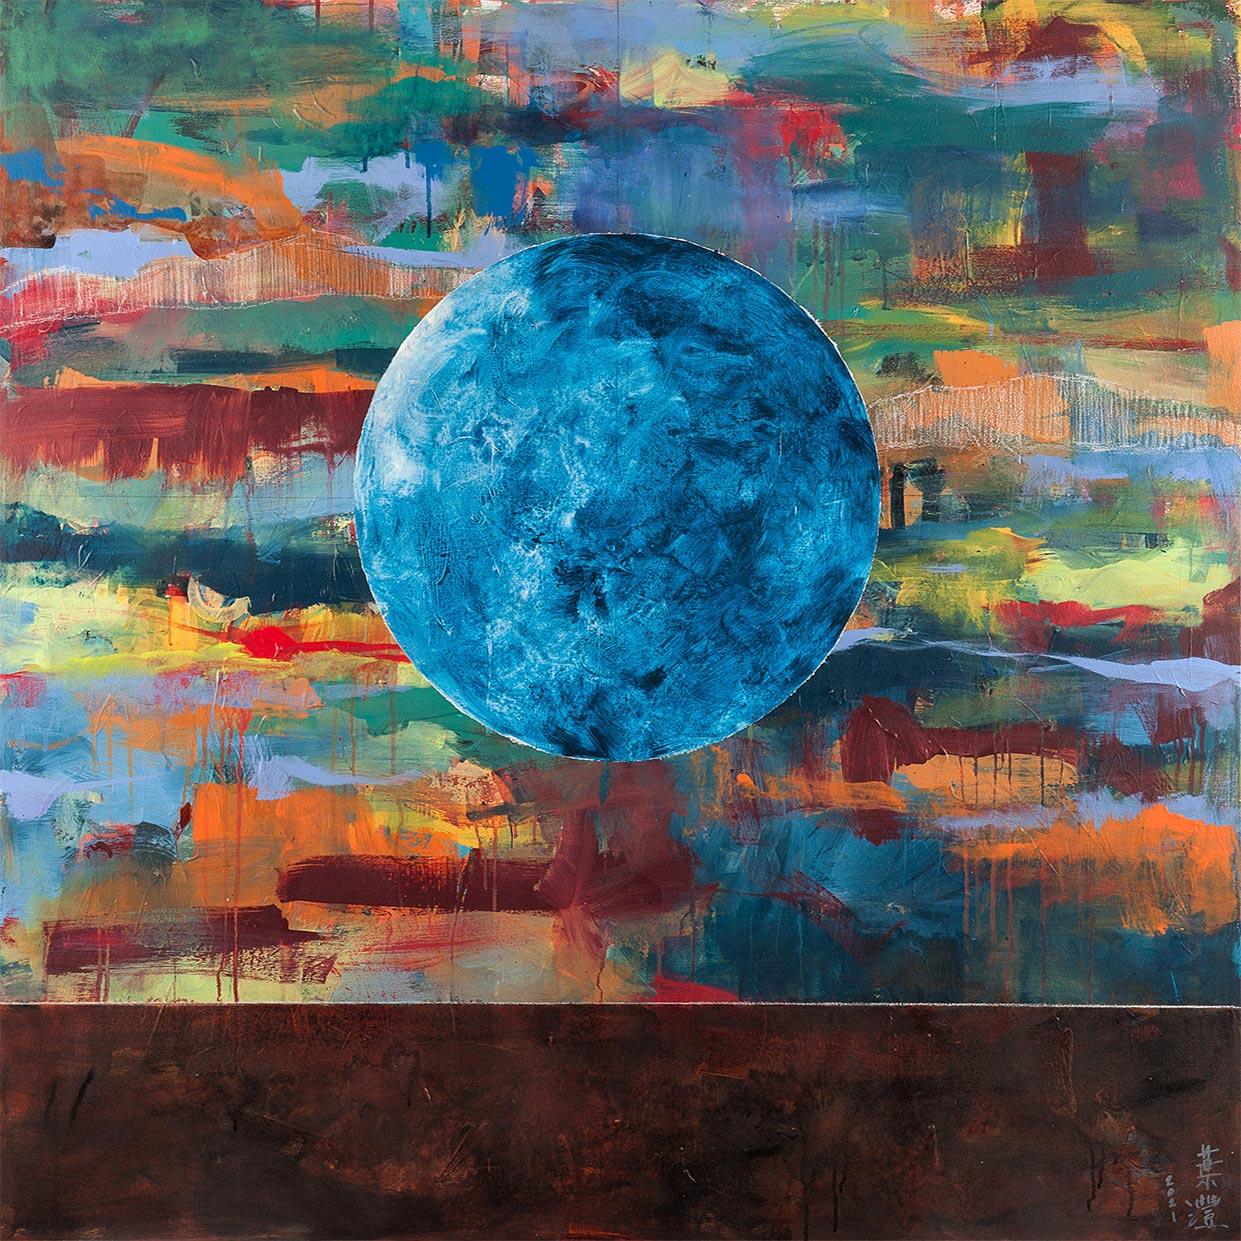 Arcadia No. 5 (Blue Planet II), 2021